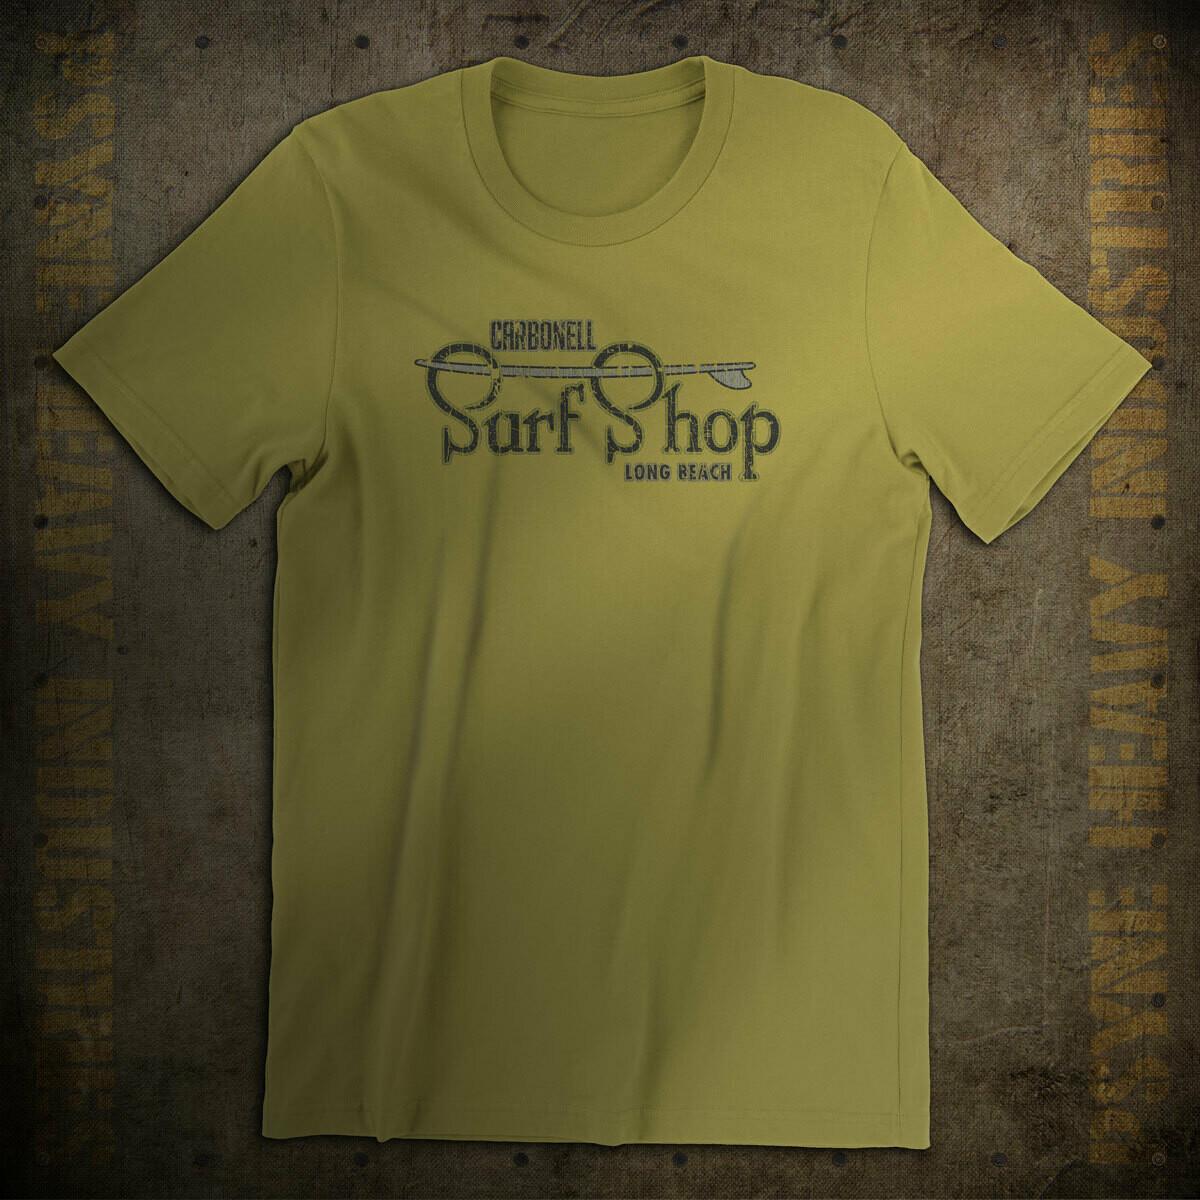 Carbonell Surf Shop Vintage T-Shirt